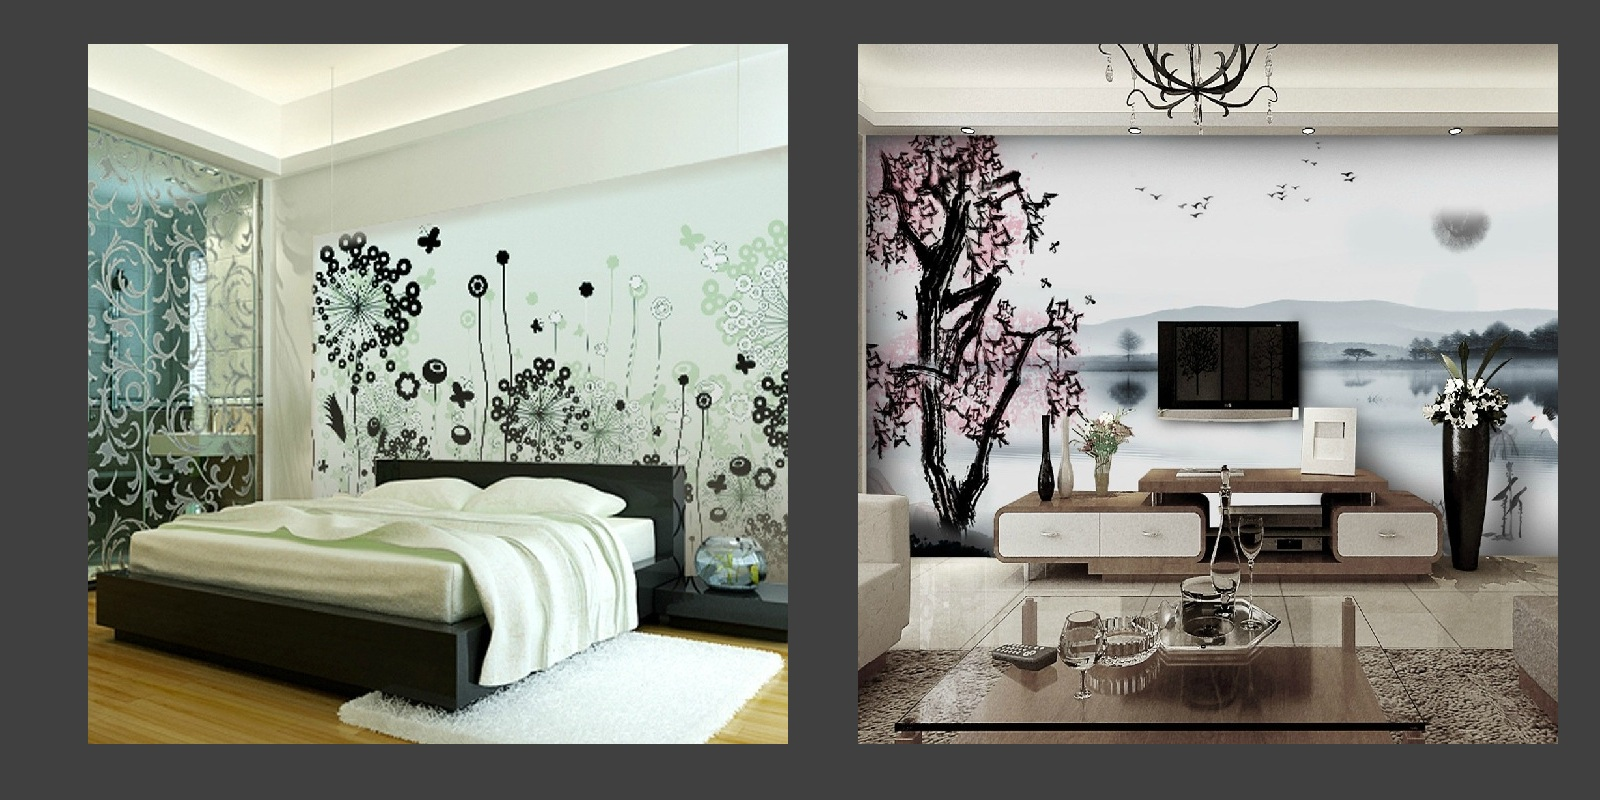 home wallpaper design 2015   Grasscloth Wallpaper. Wallpaper for Home   WallpaperSafari